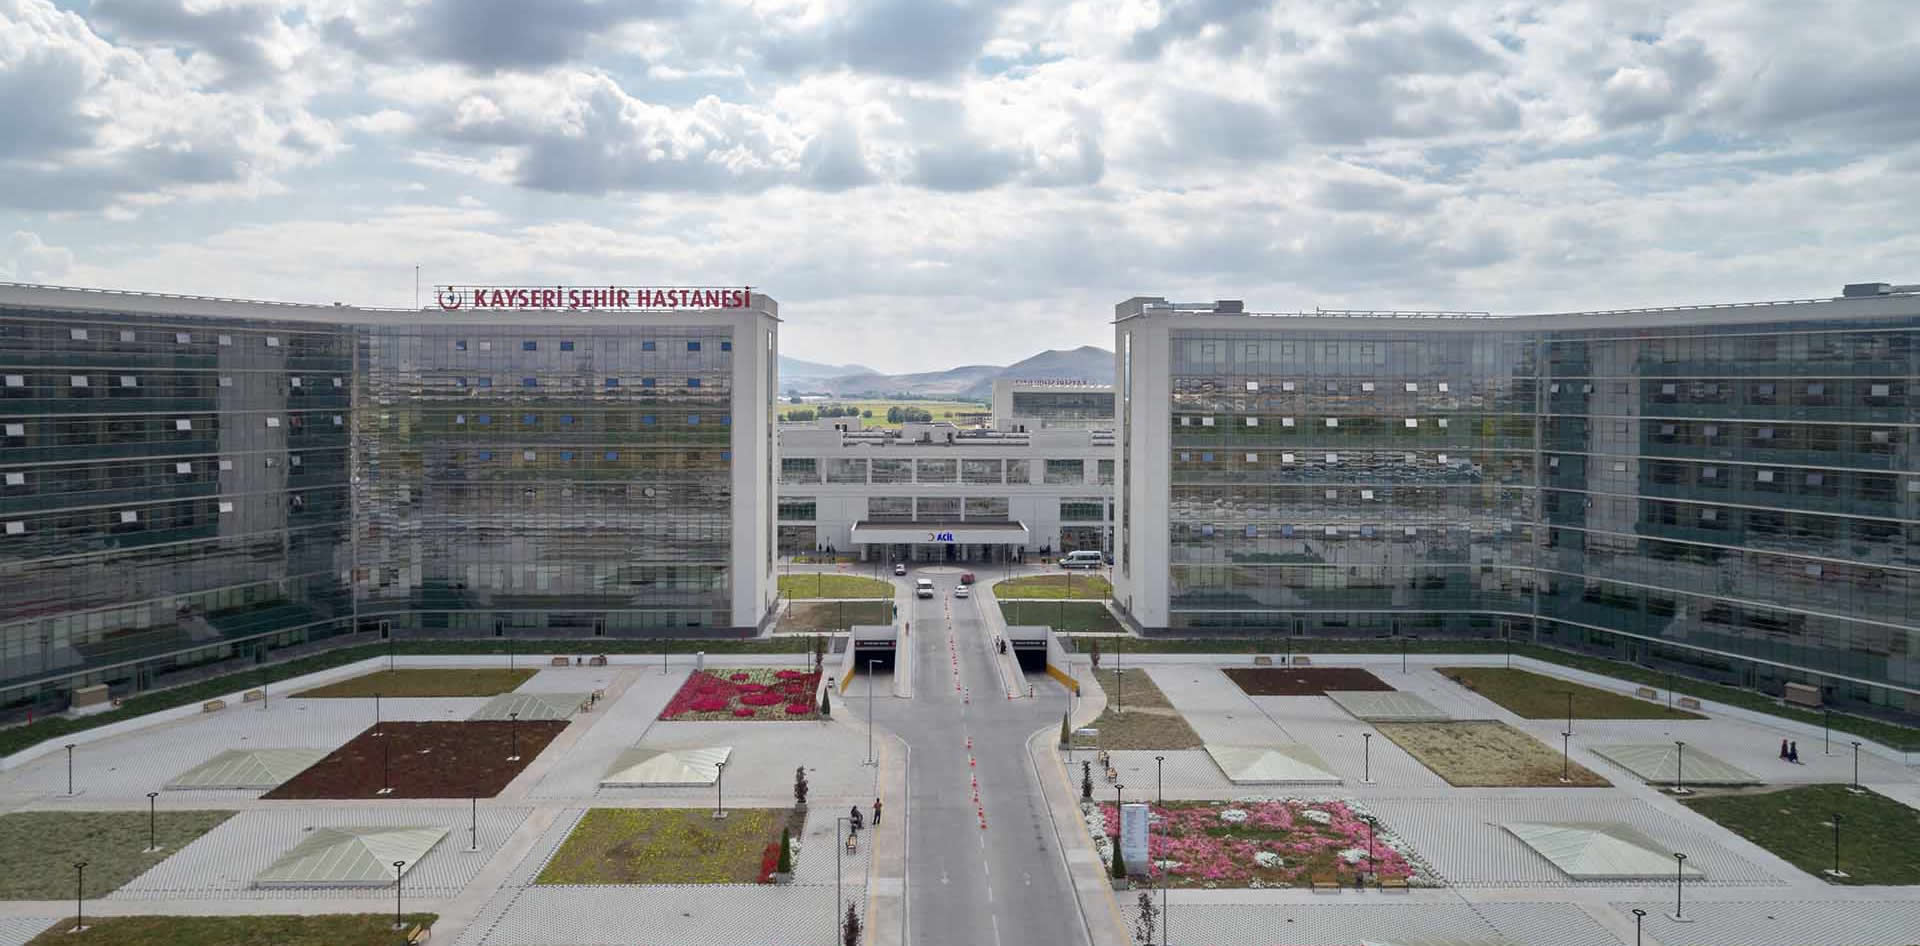 Kayseri Şehir Hastanesi Randevu